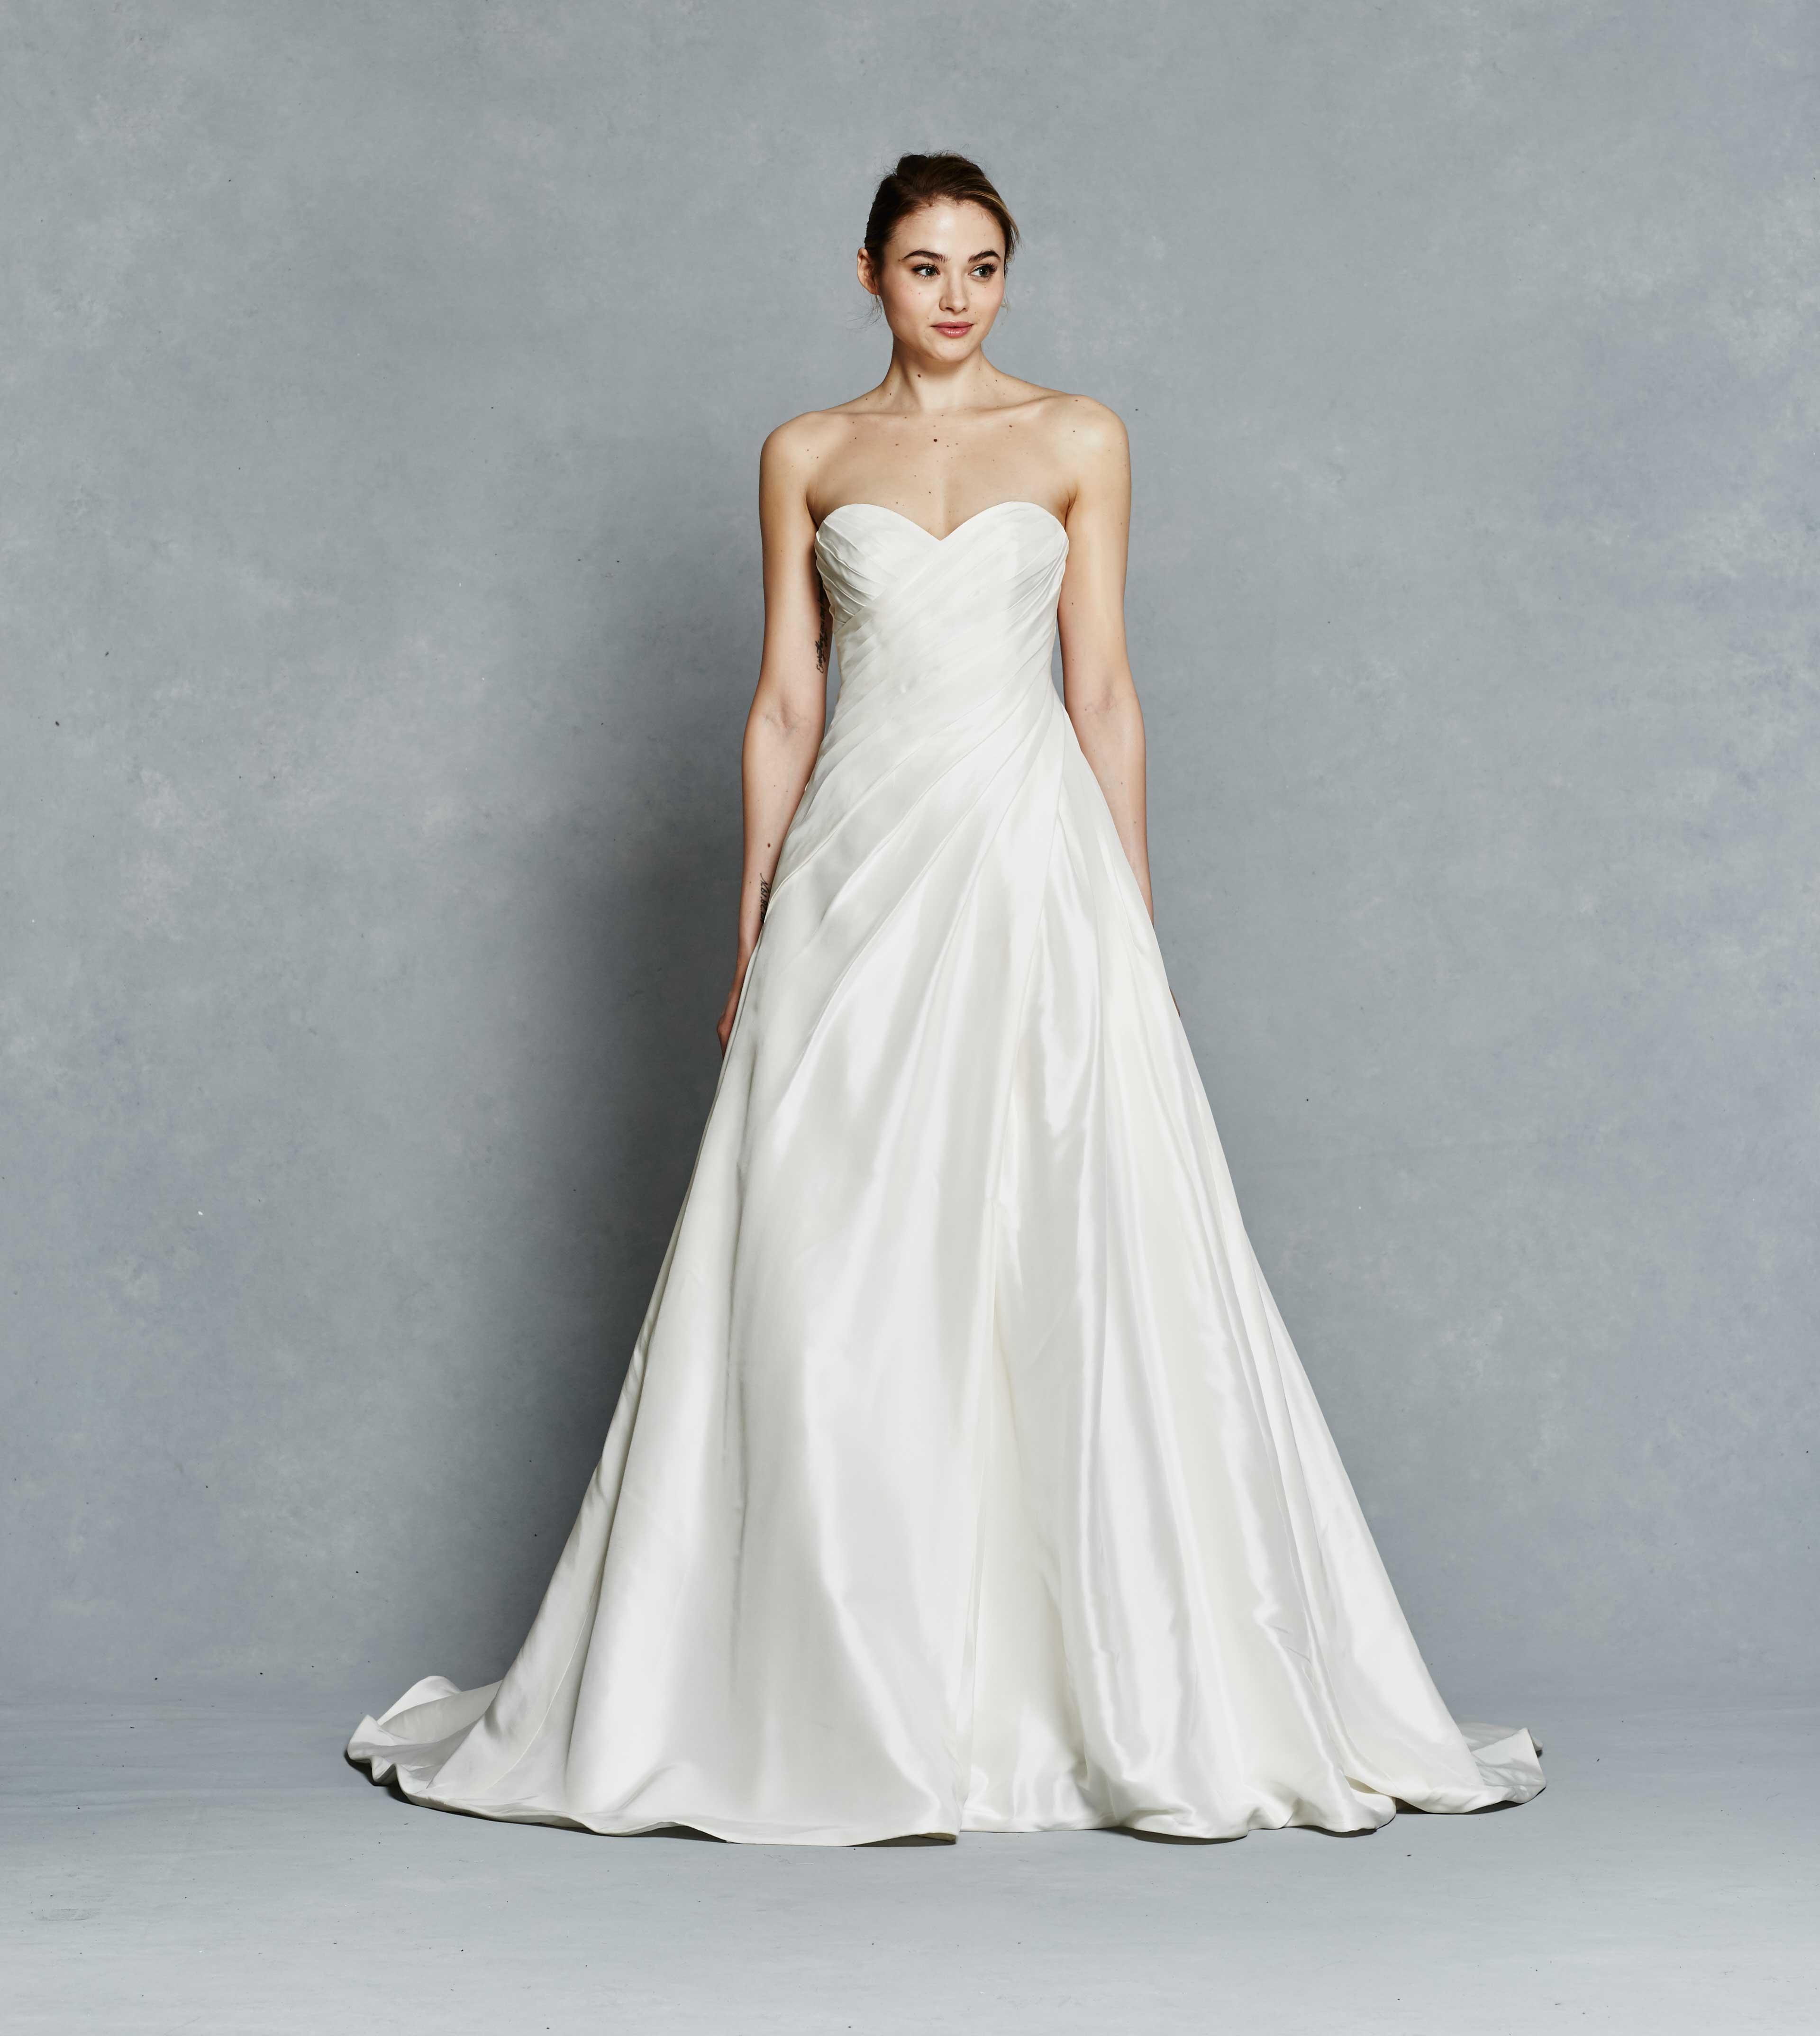 Simple Wedding Dresses: Classic Designer Bridal Gown